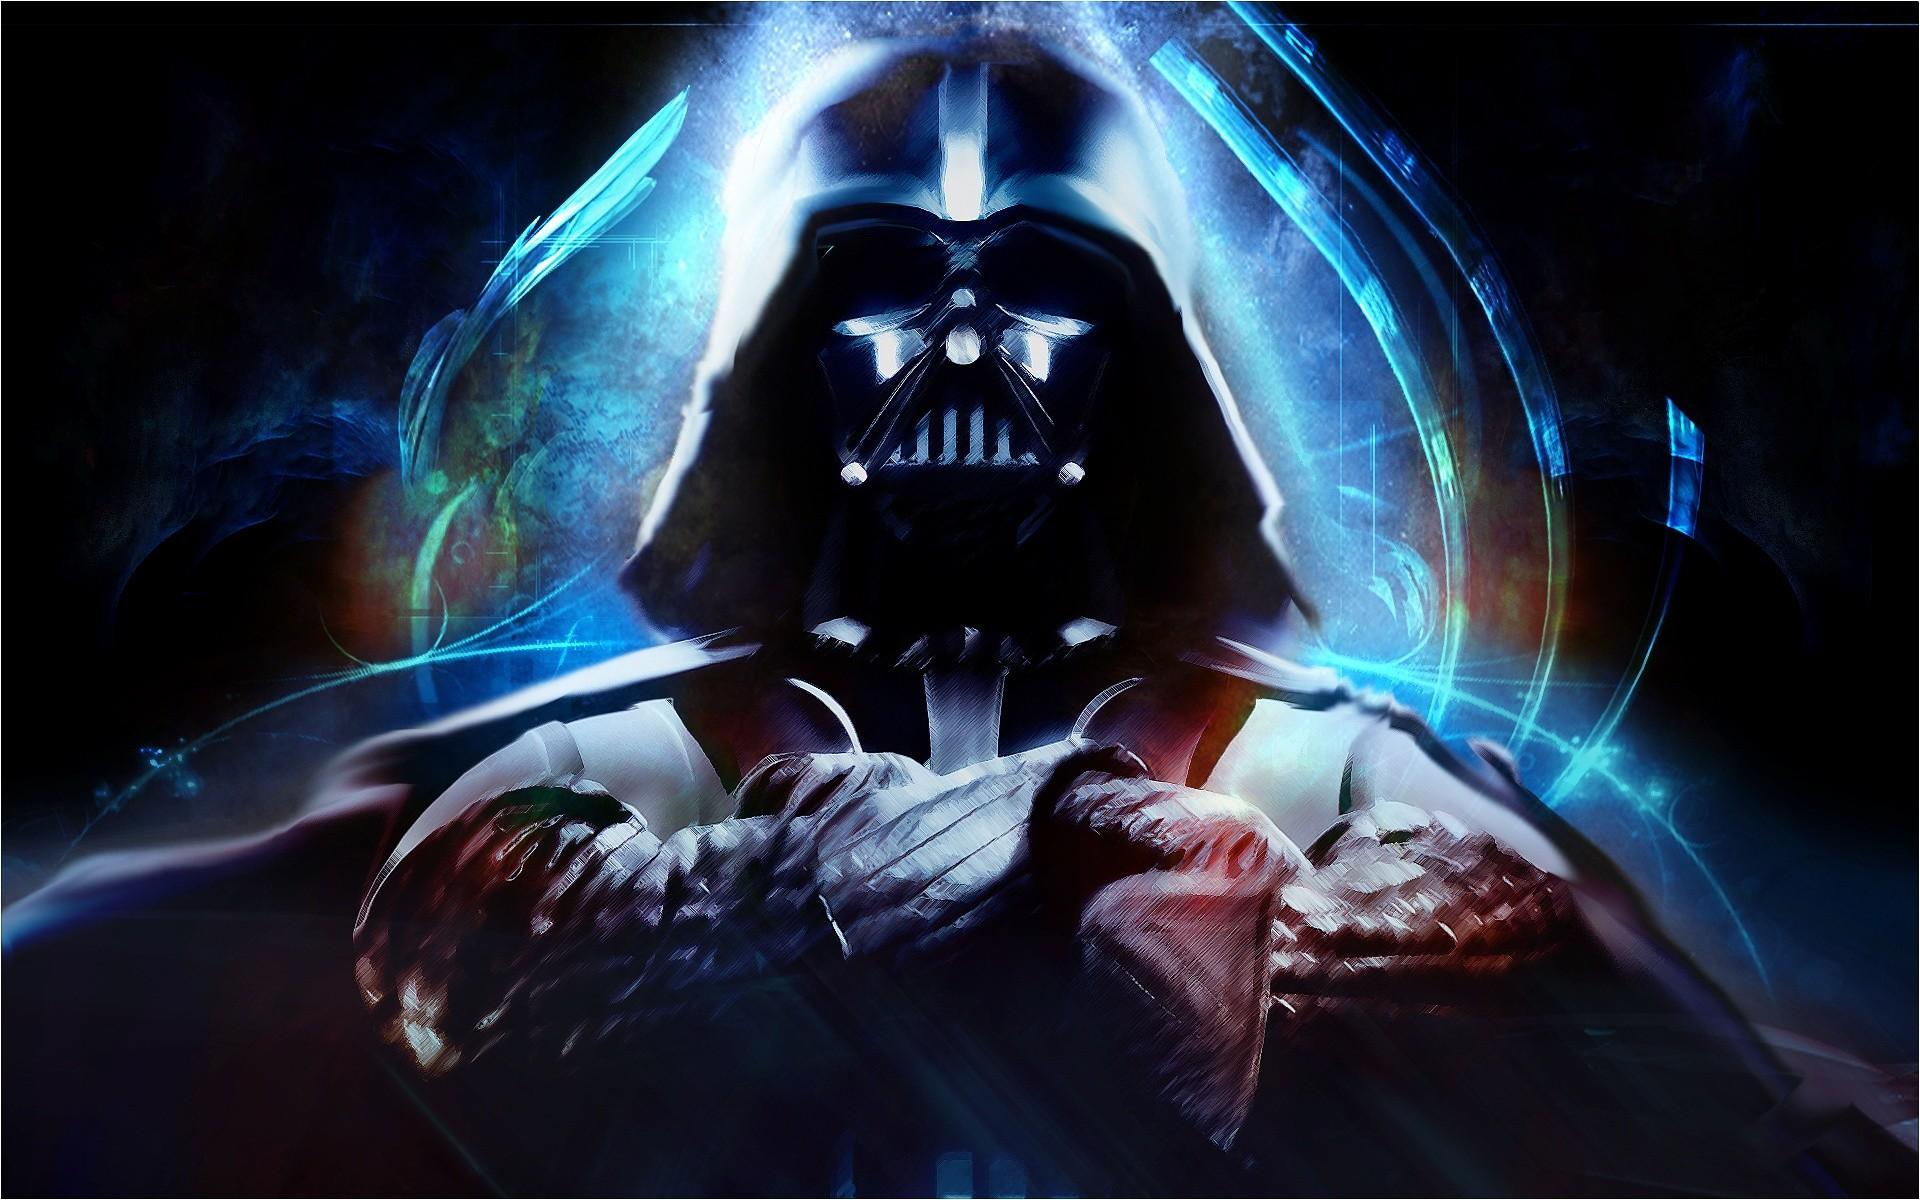 Star Wars Wallpaper Download